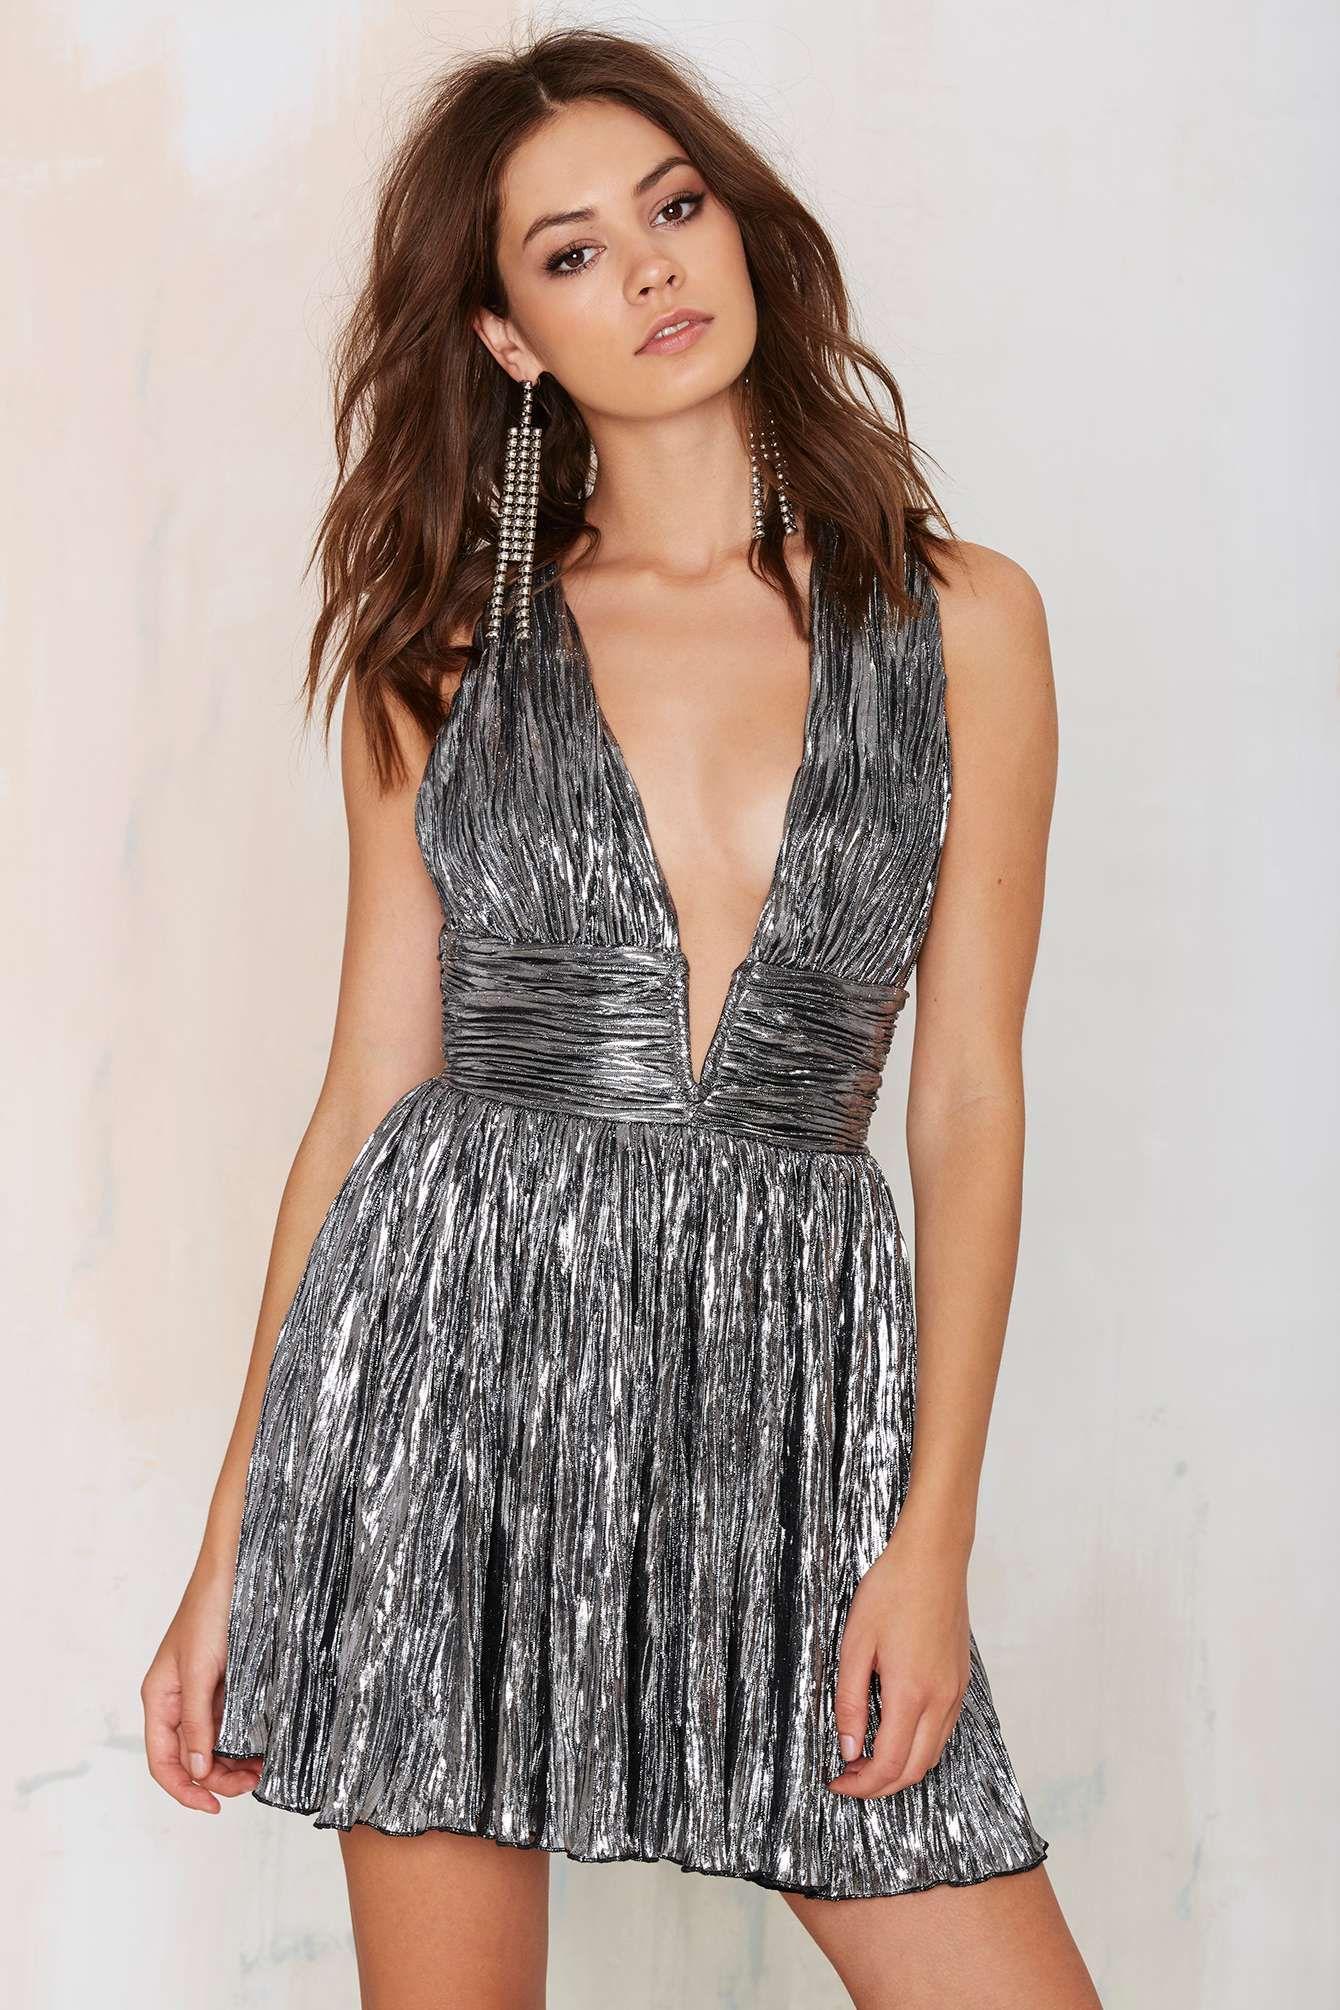 Nasty gal gilt trip metallic dress silver shop clothes at nasty